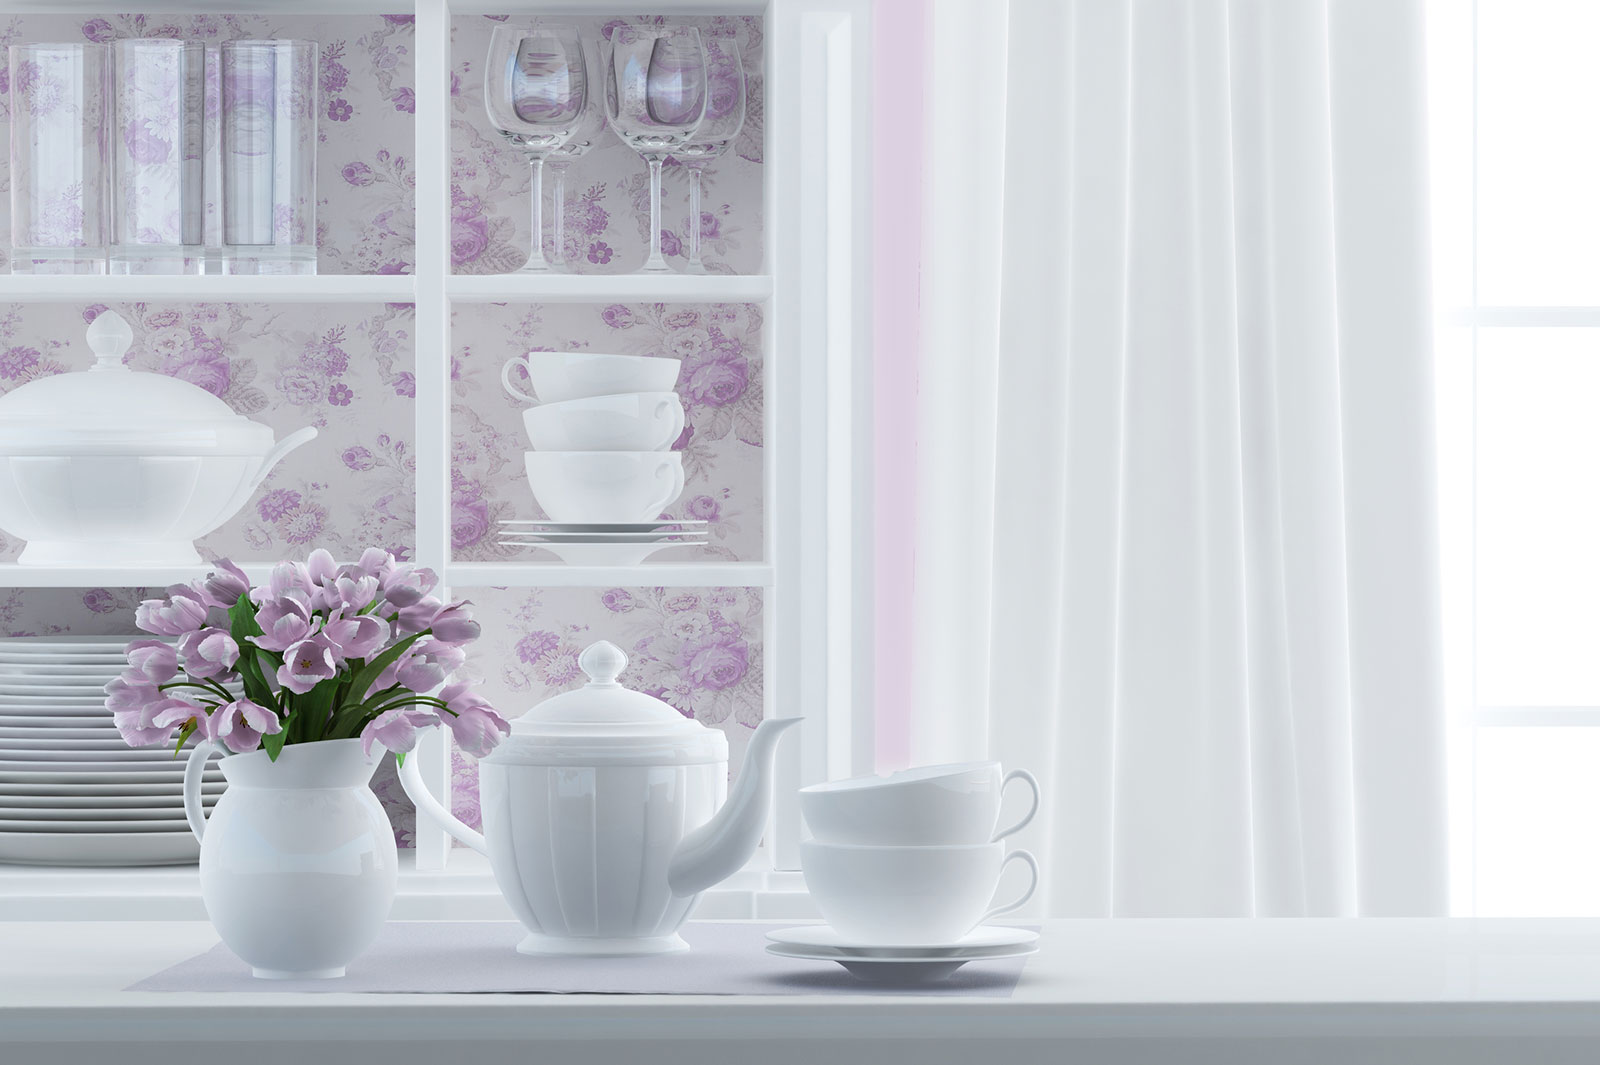 Self-adhesive Vinyl Skin Sticker Plain Pink Glossy Decorative Design for Single Light Cover